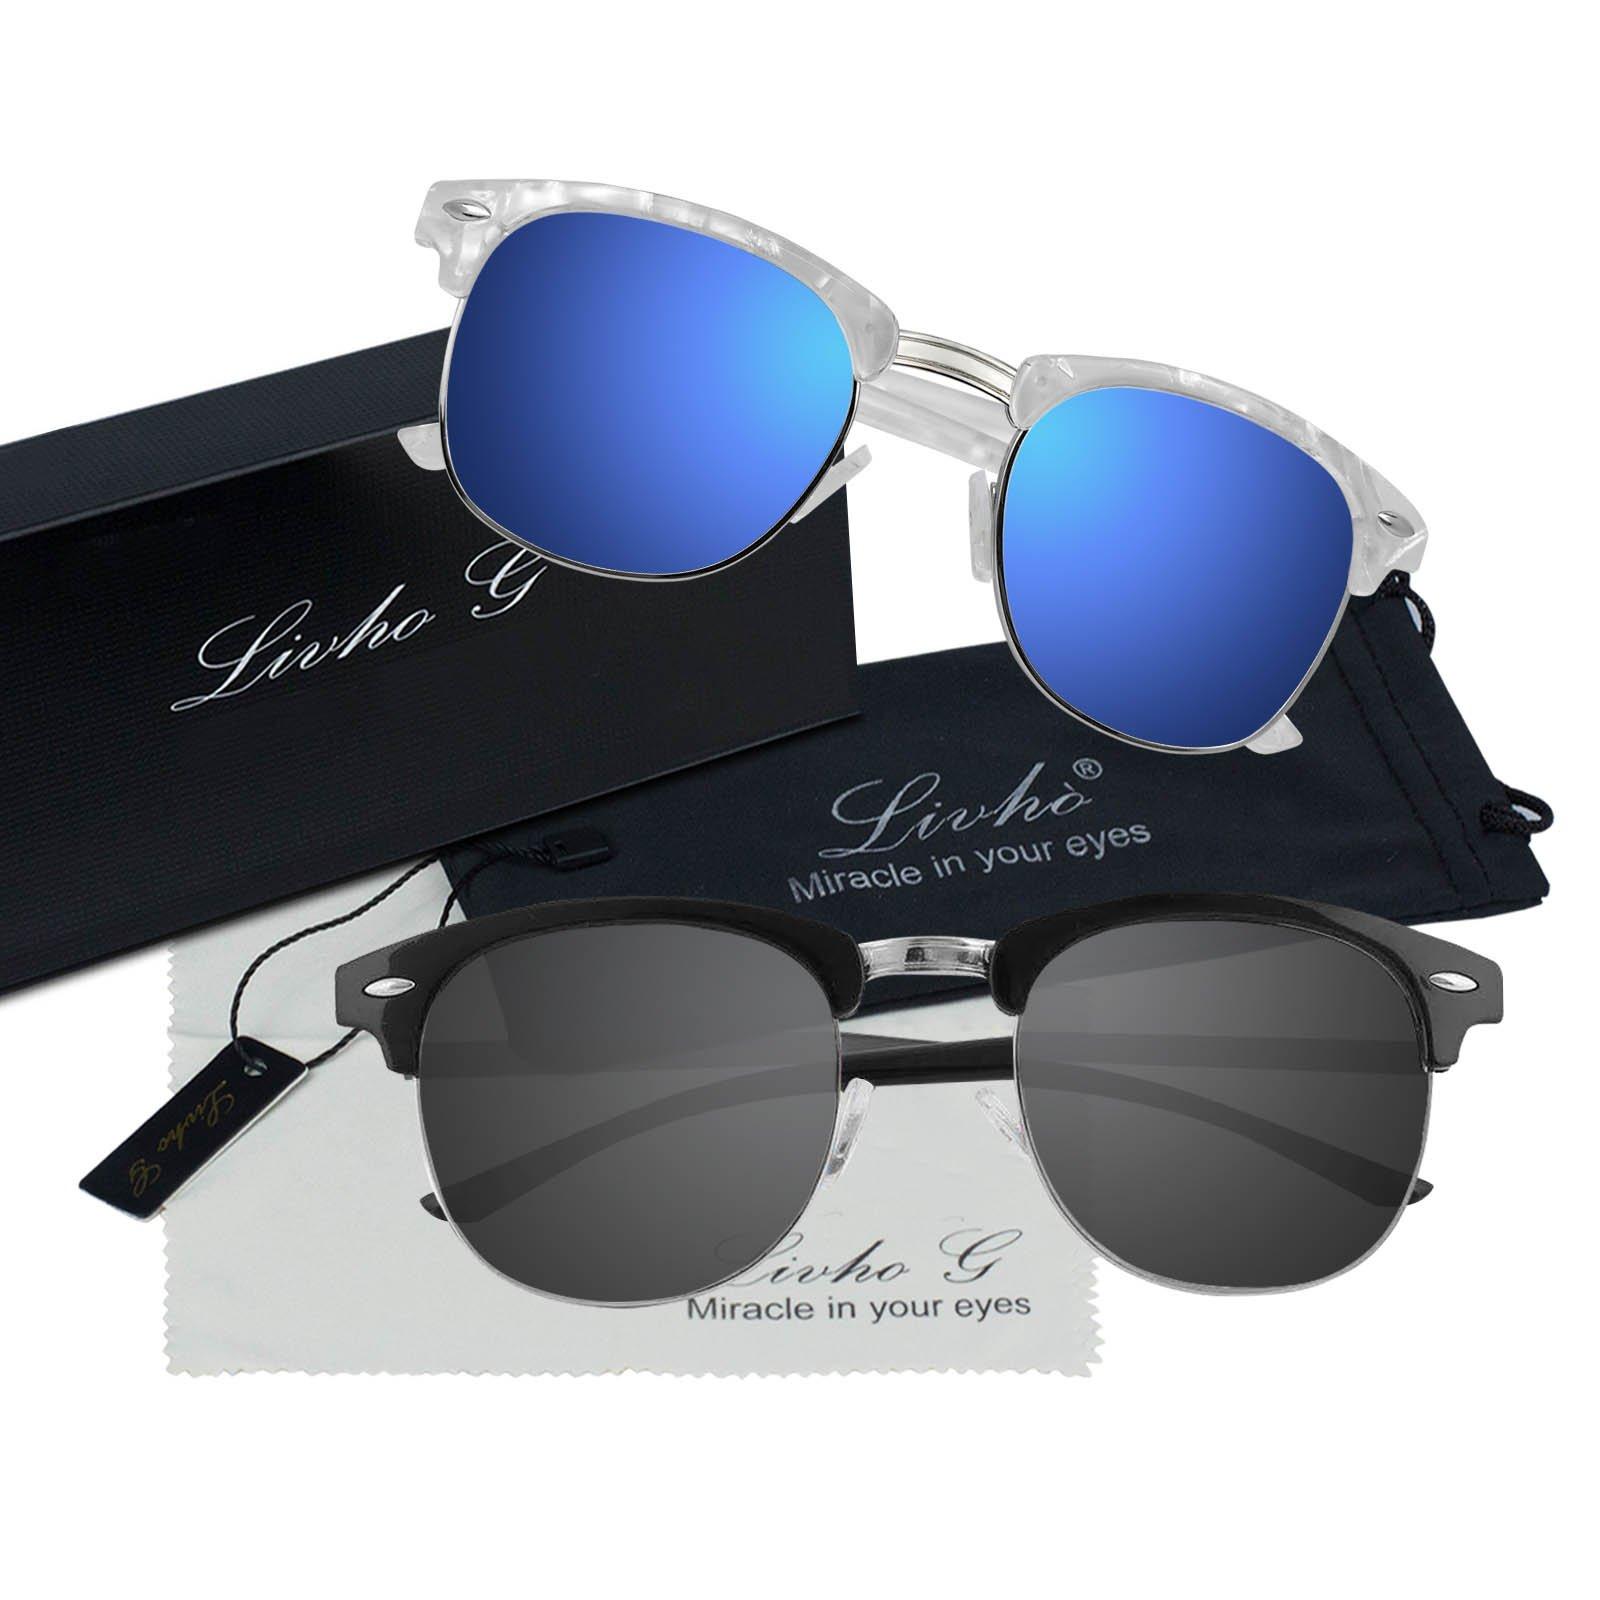 Livhò Polarized Sunglasses Women Men Semi Rimless Frame Retro Sunglasses (White Blue + Black Grey) by Livhò